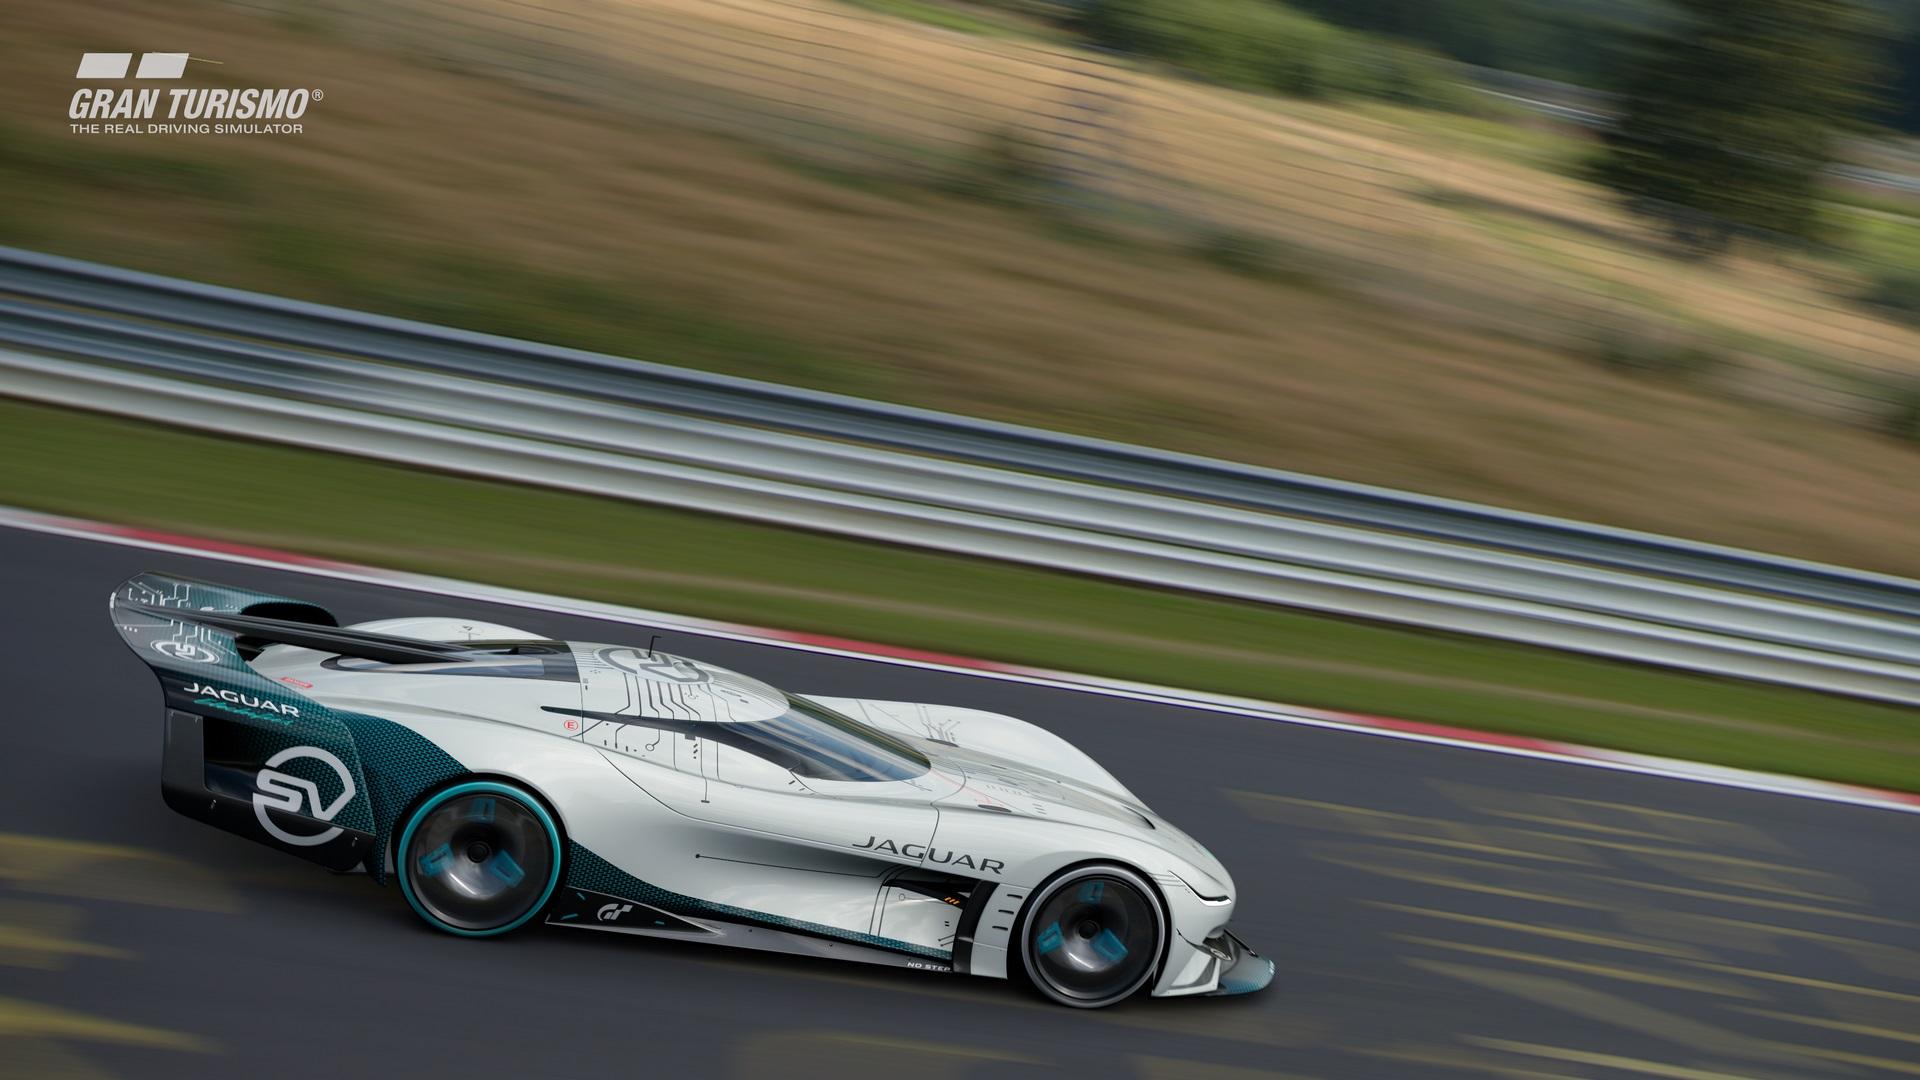 Jaguar-Vision-Gran-Turismo-SV-11